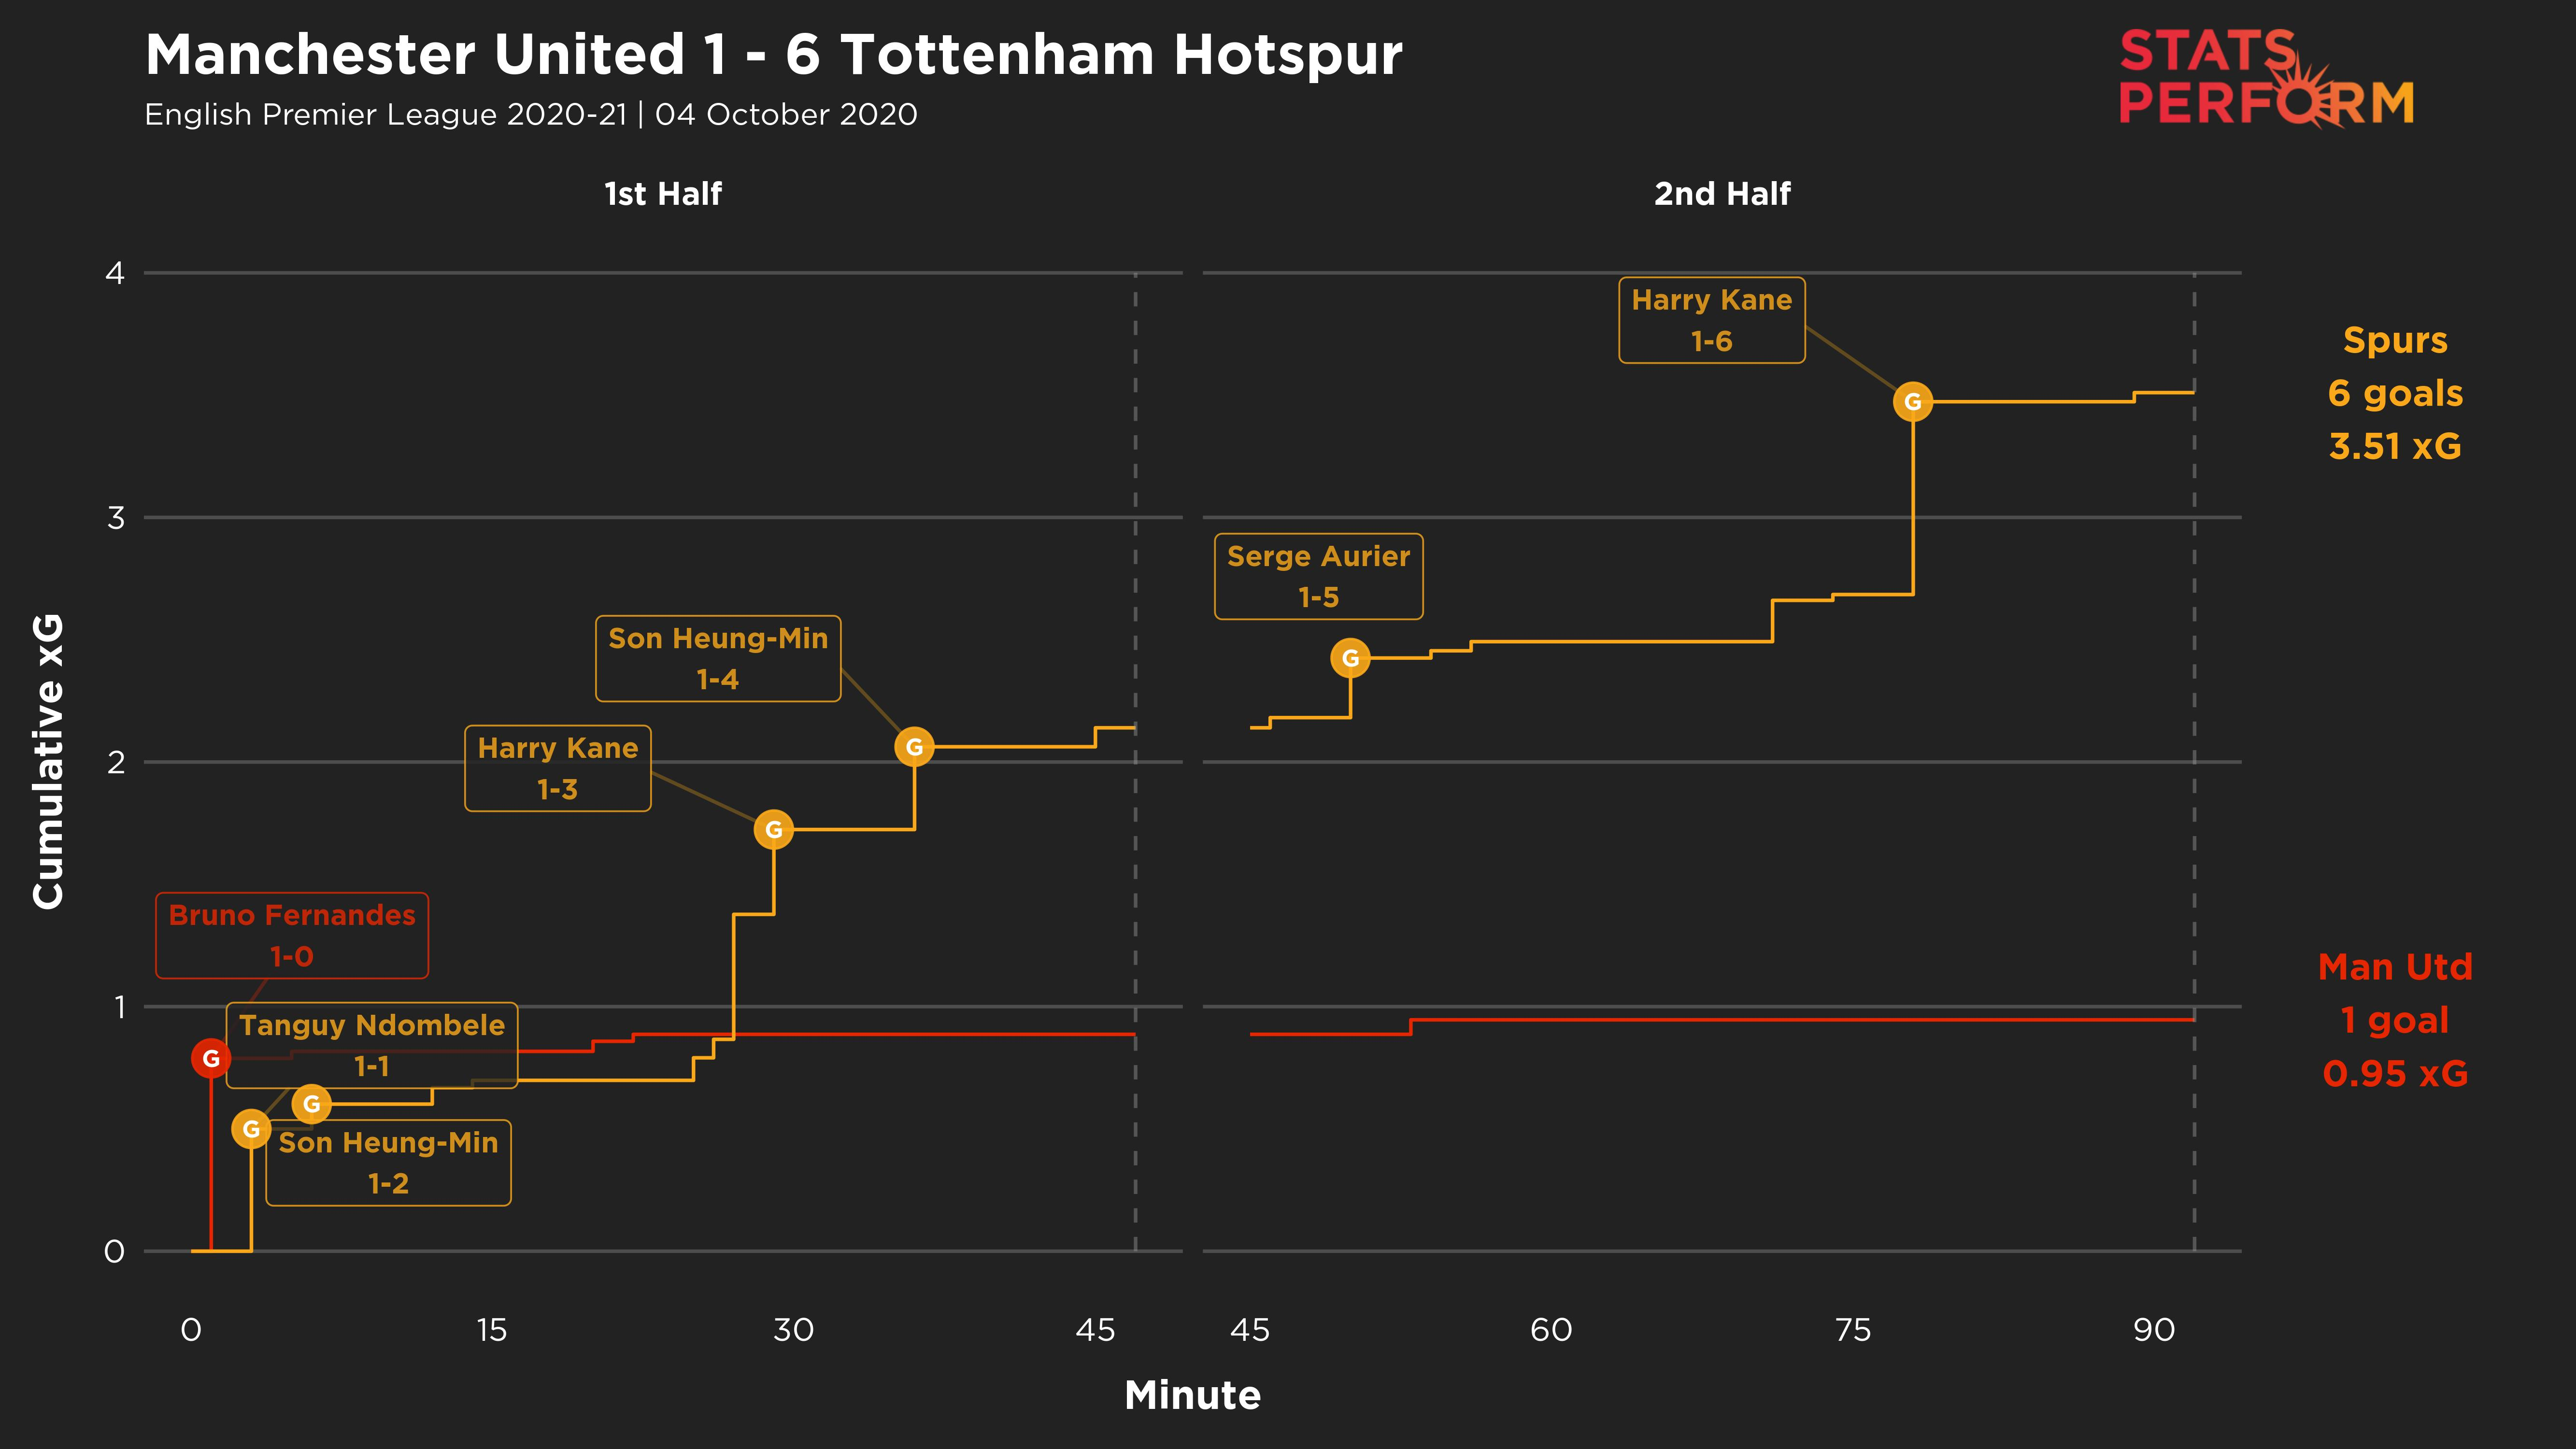 Manchester United's stunning defeat to Tottenham